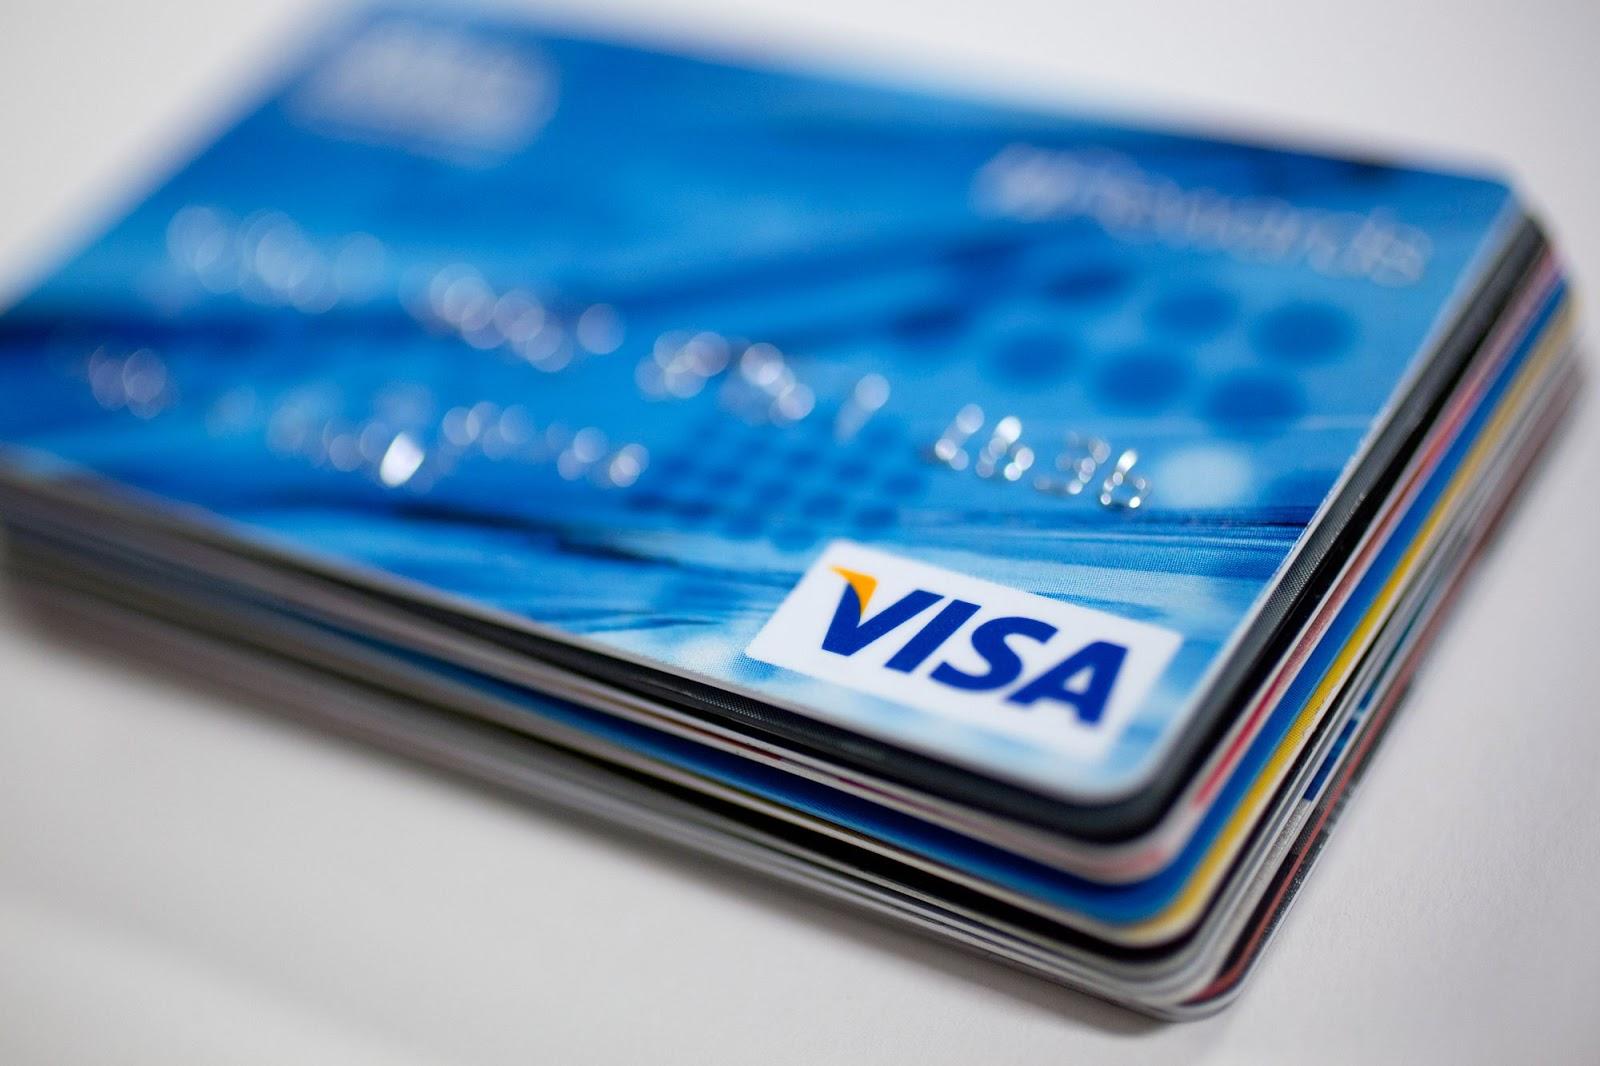 visa,master card,LeoPay visa